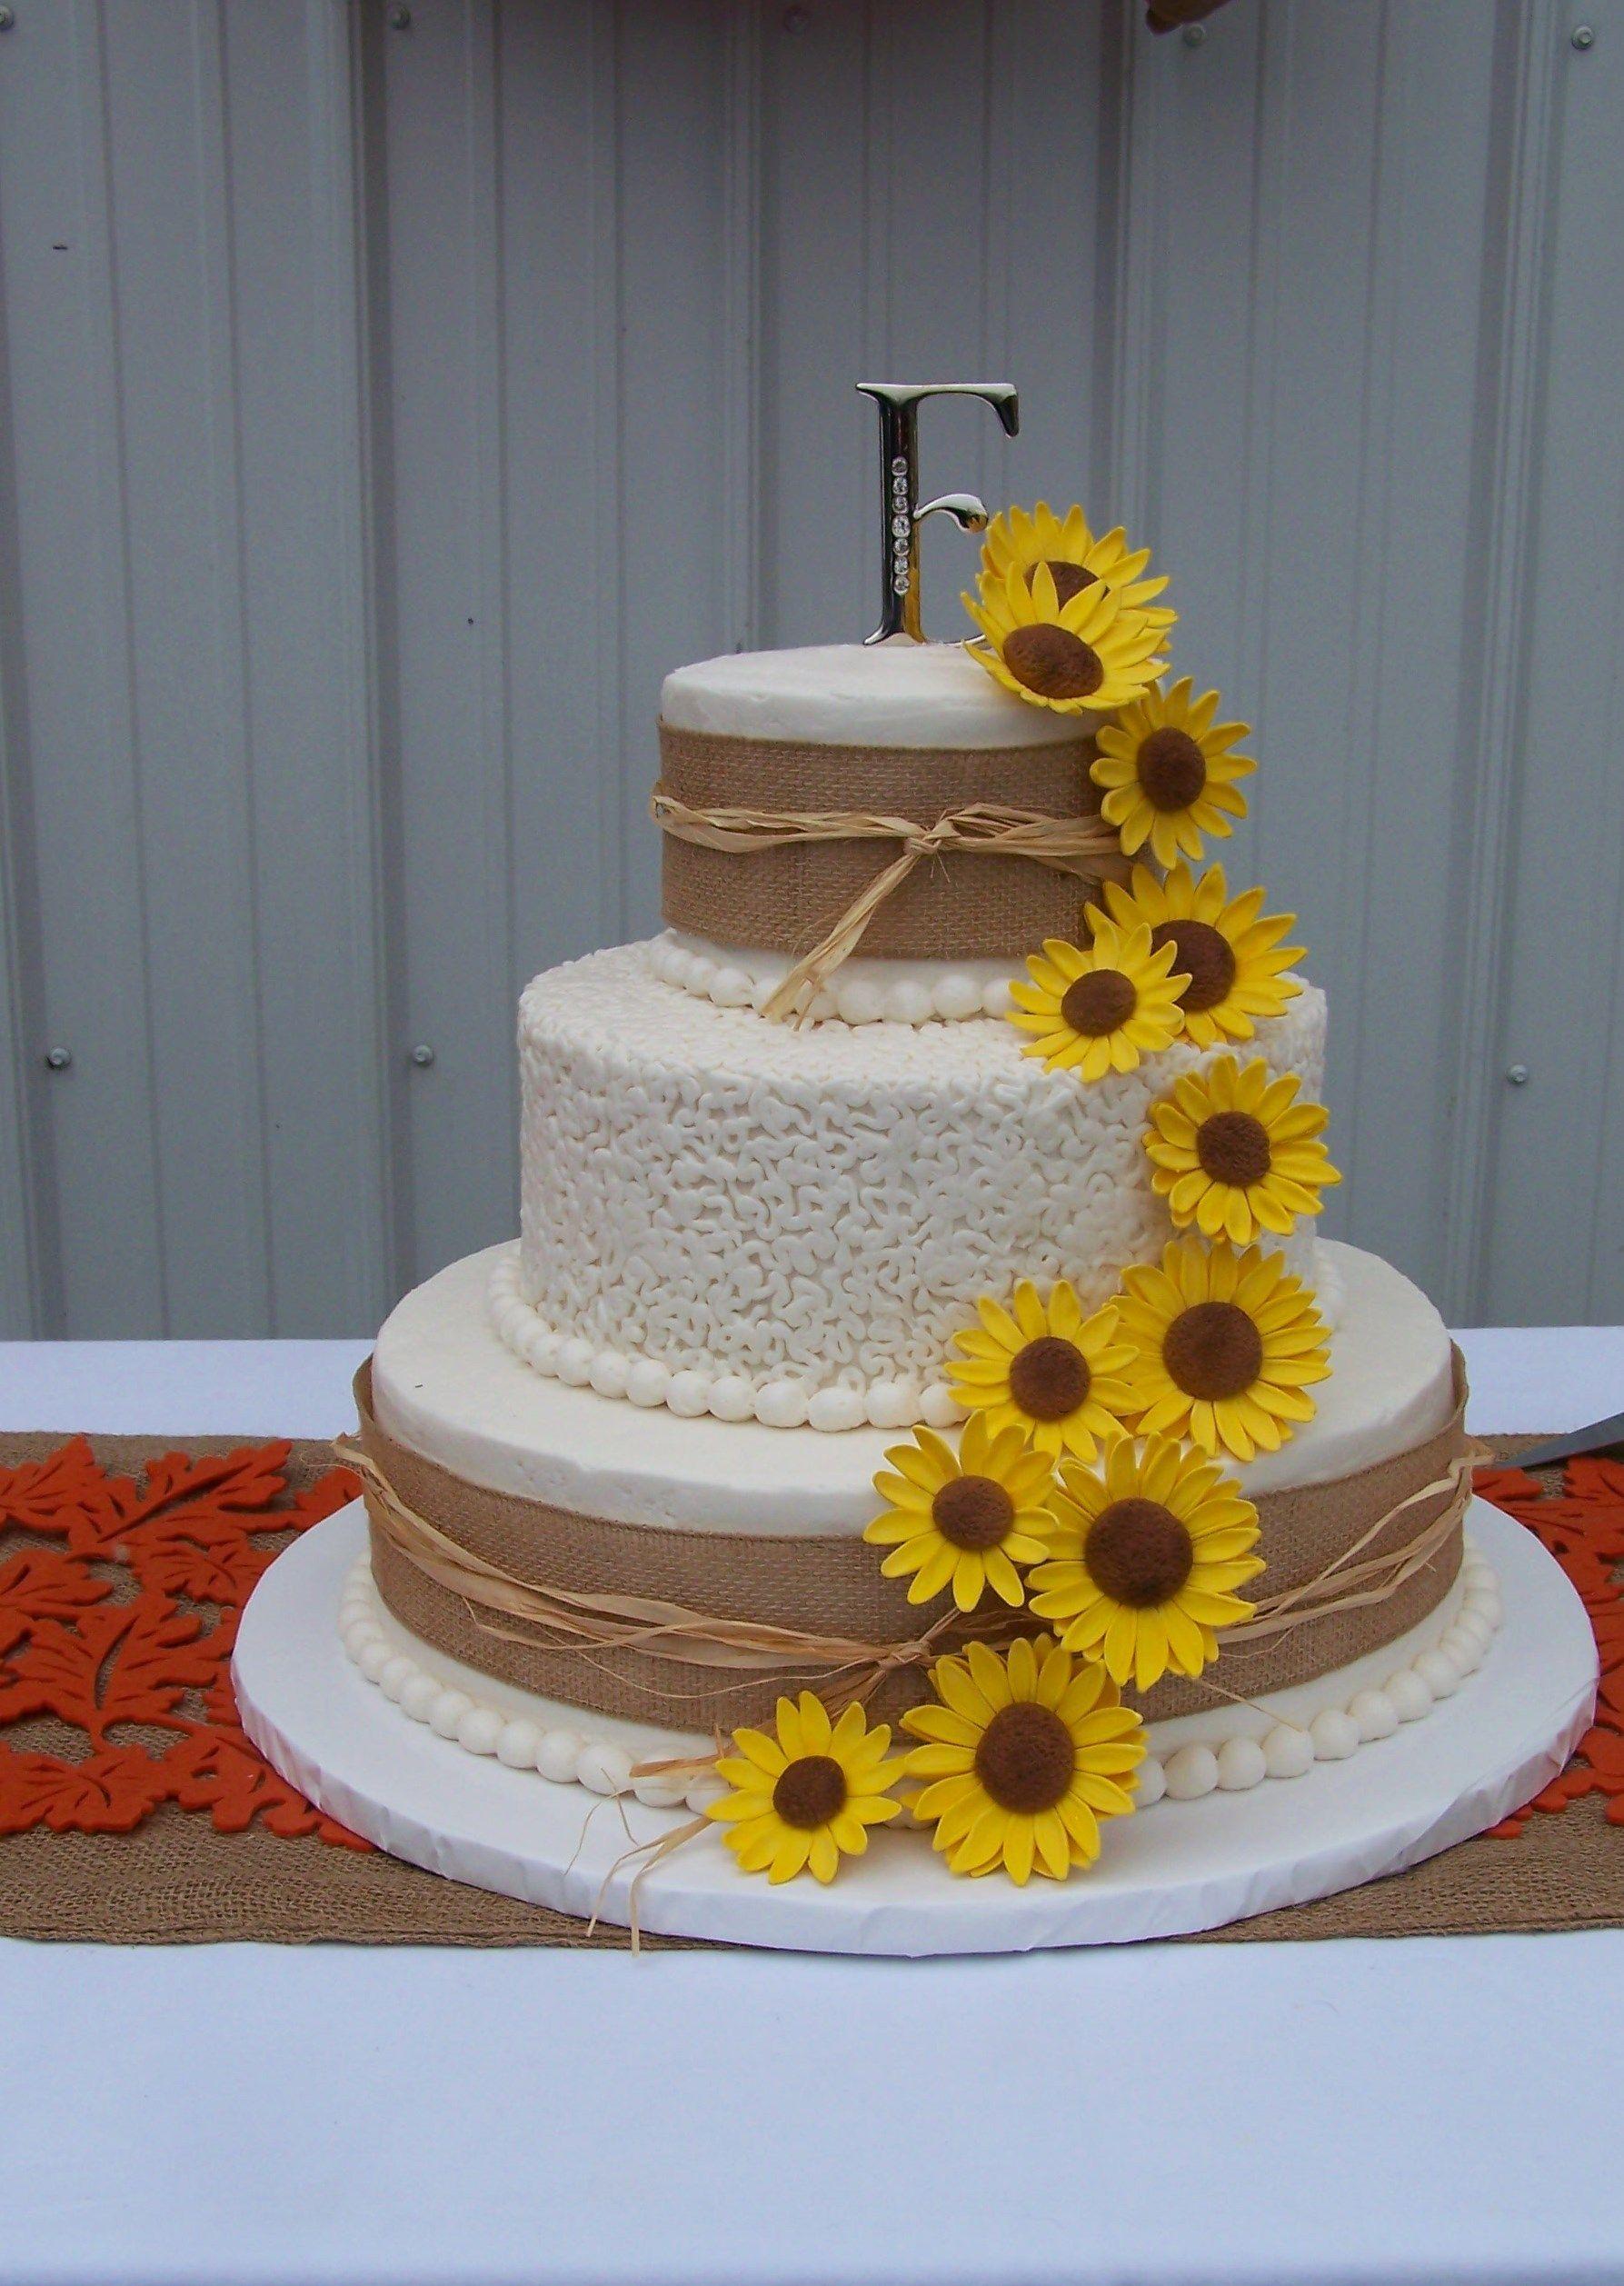 rustic sunflowers wedding cake wedding cakes by sherry pinterest rustic sunflower weddings. Black Bedroom Furniture Sets. Home Design Ideas